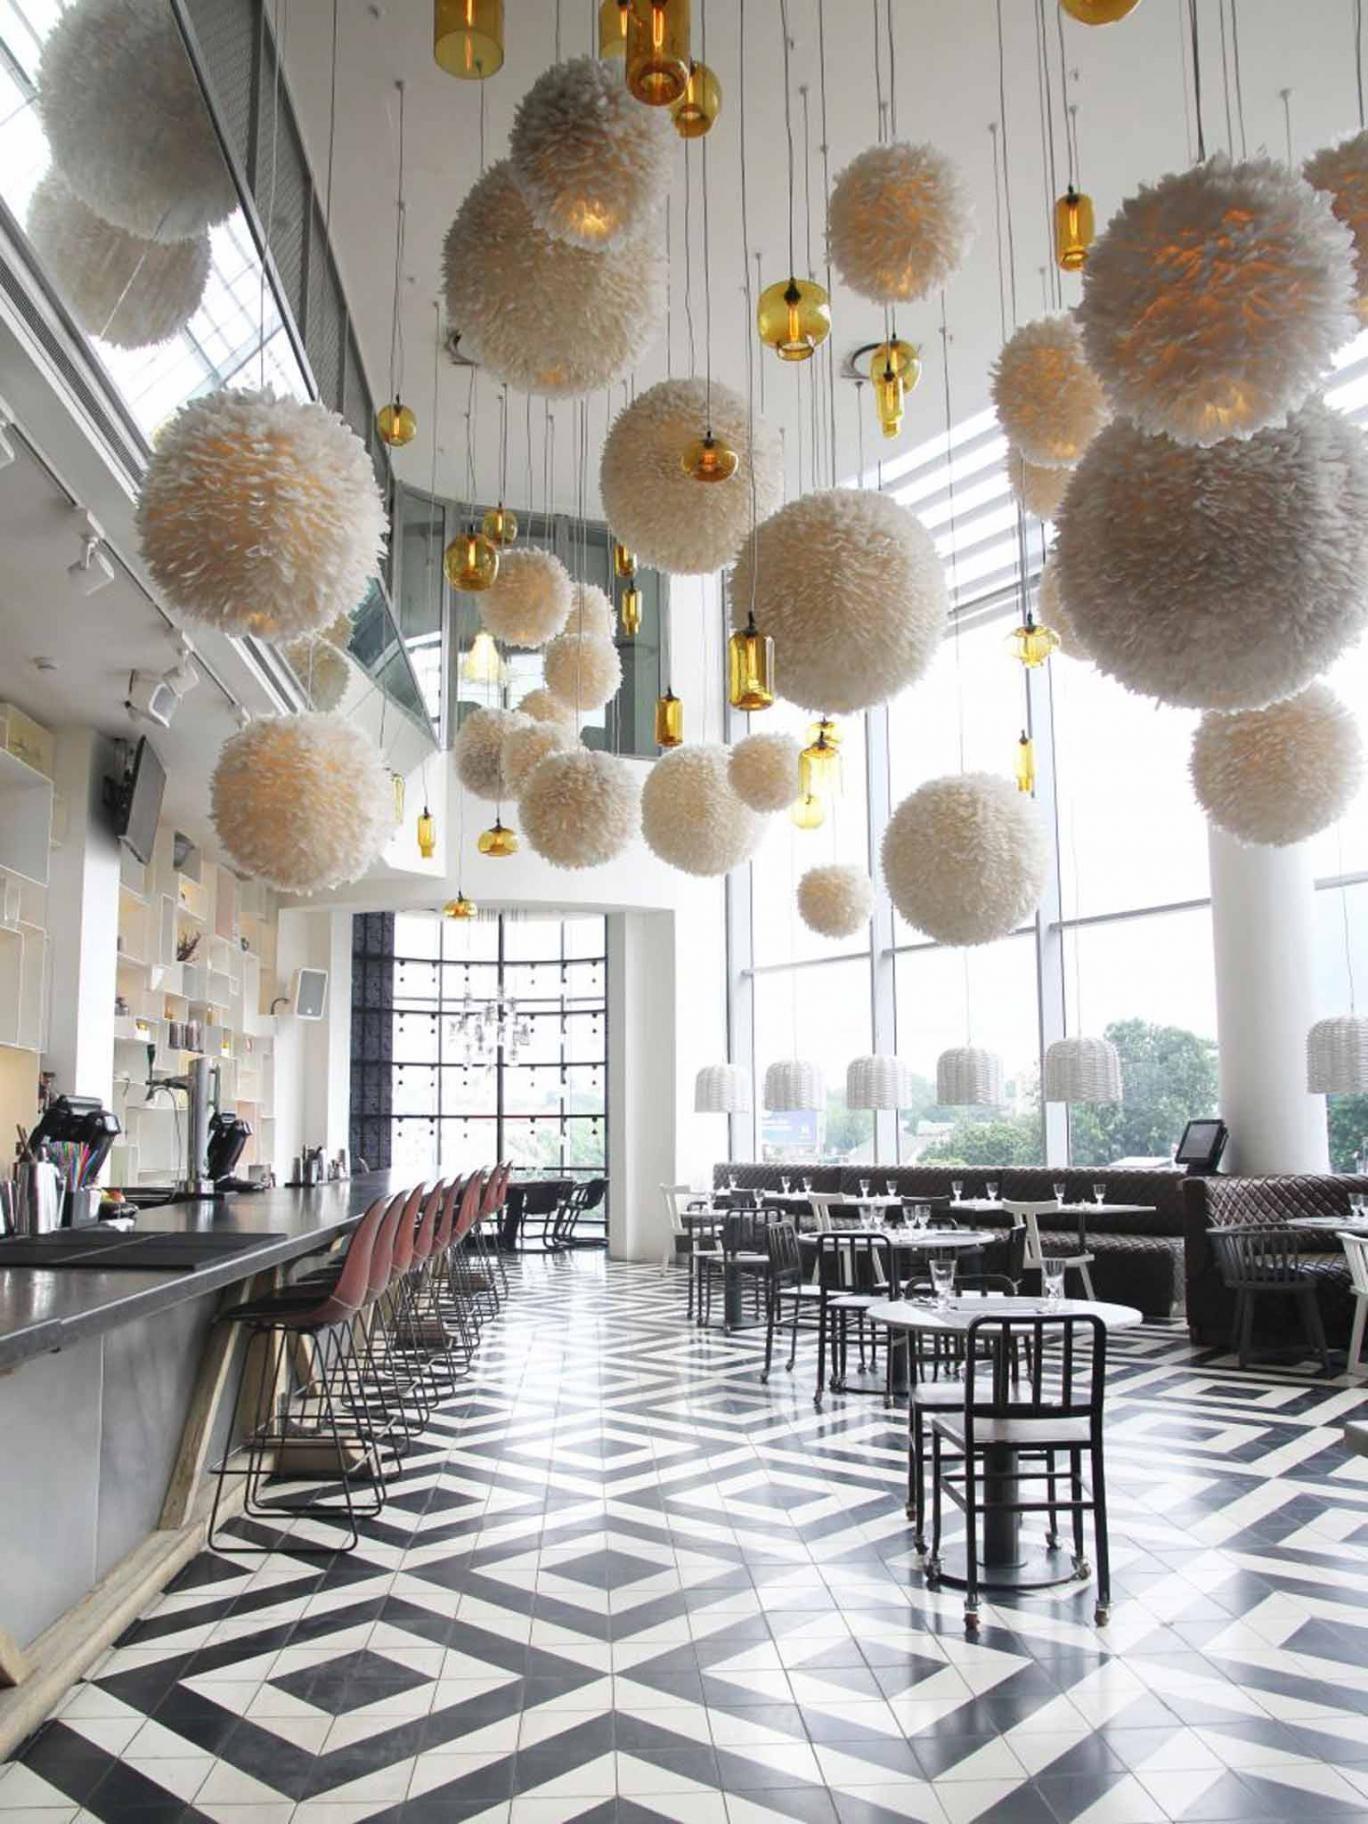 Ghana S New Creative Scene Stylish New Places To Eat